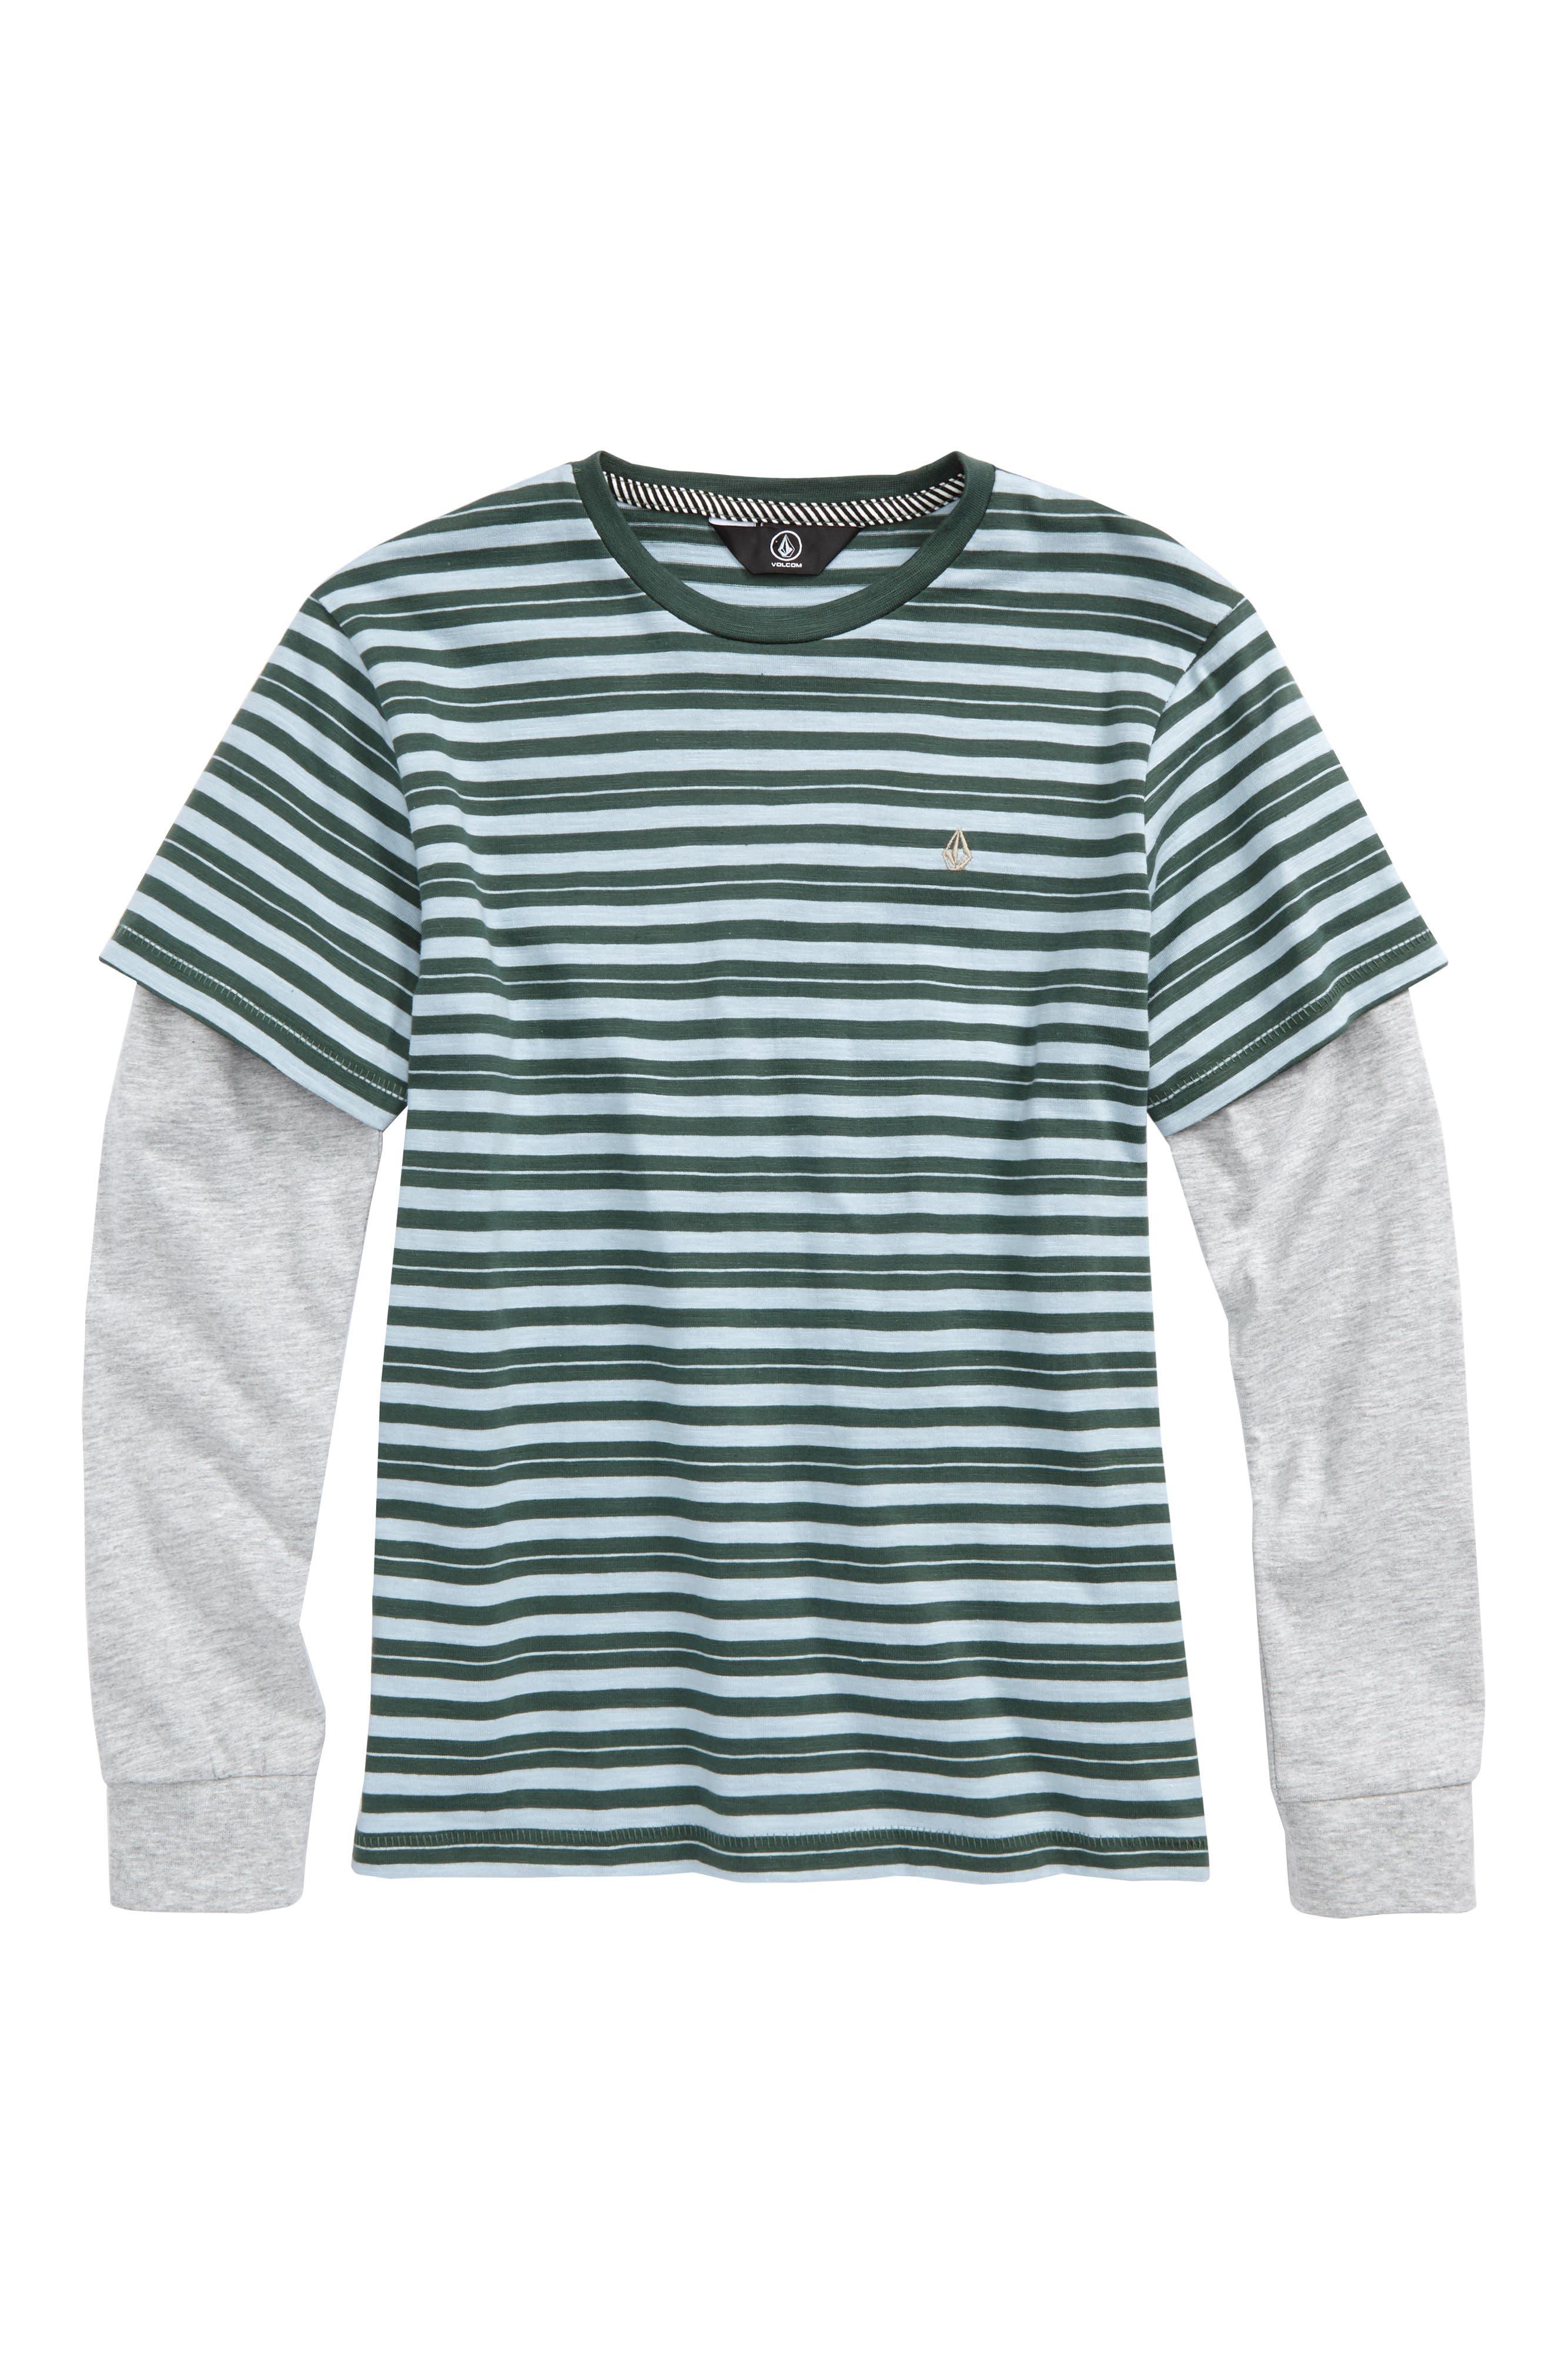 Main Image - Volcom Impact Twofer Layered T-Shirt (Big Boys)